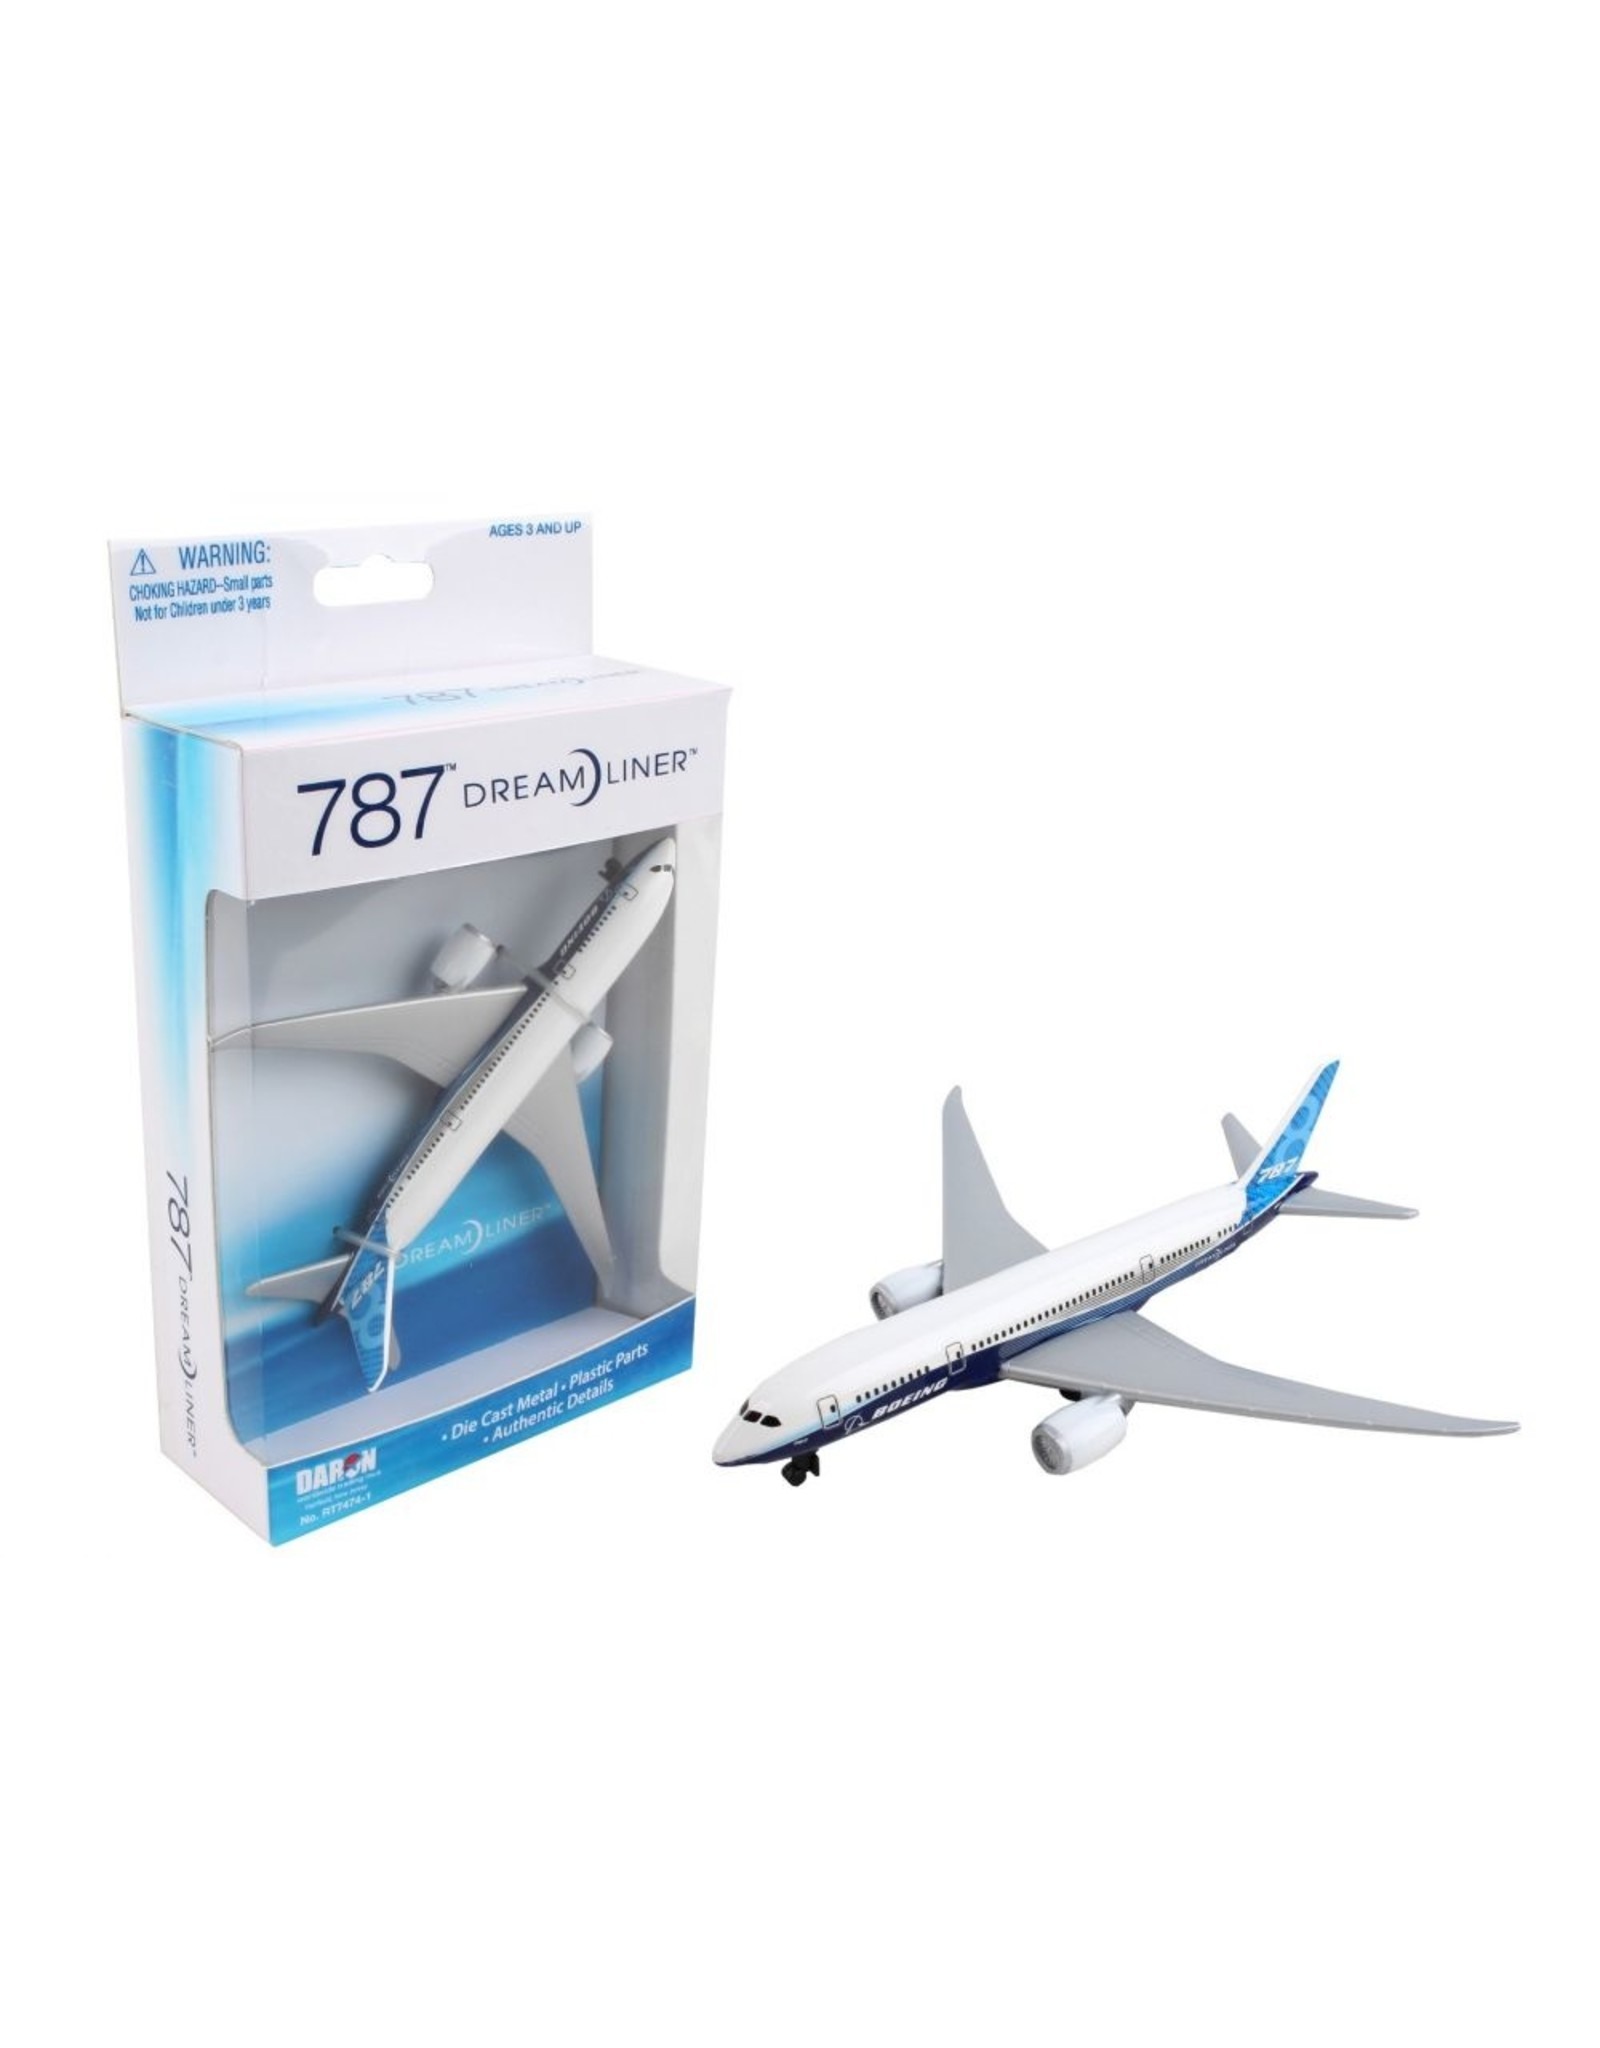 Single Plane Boeing 787 new